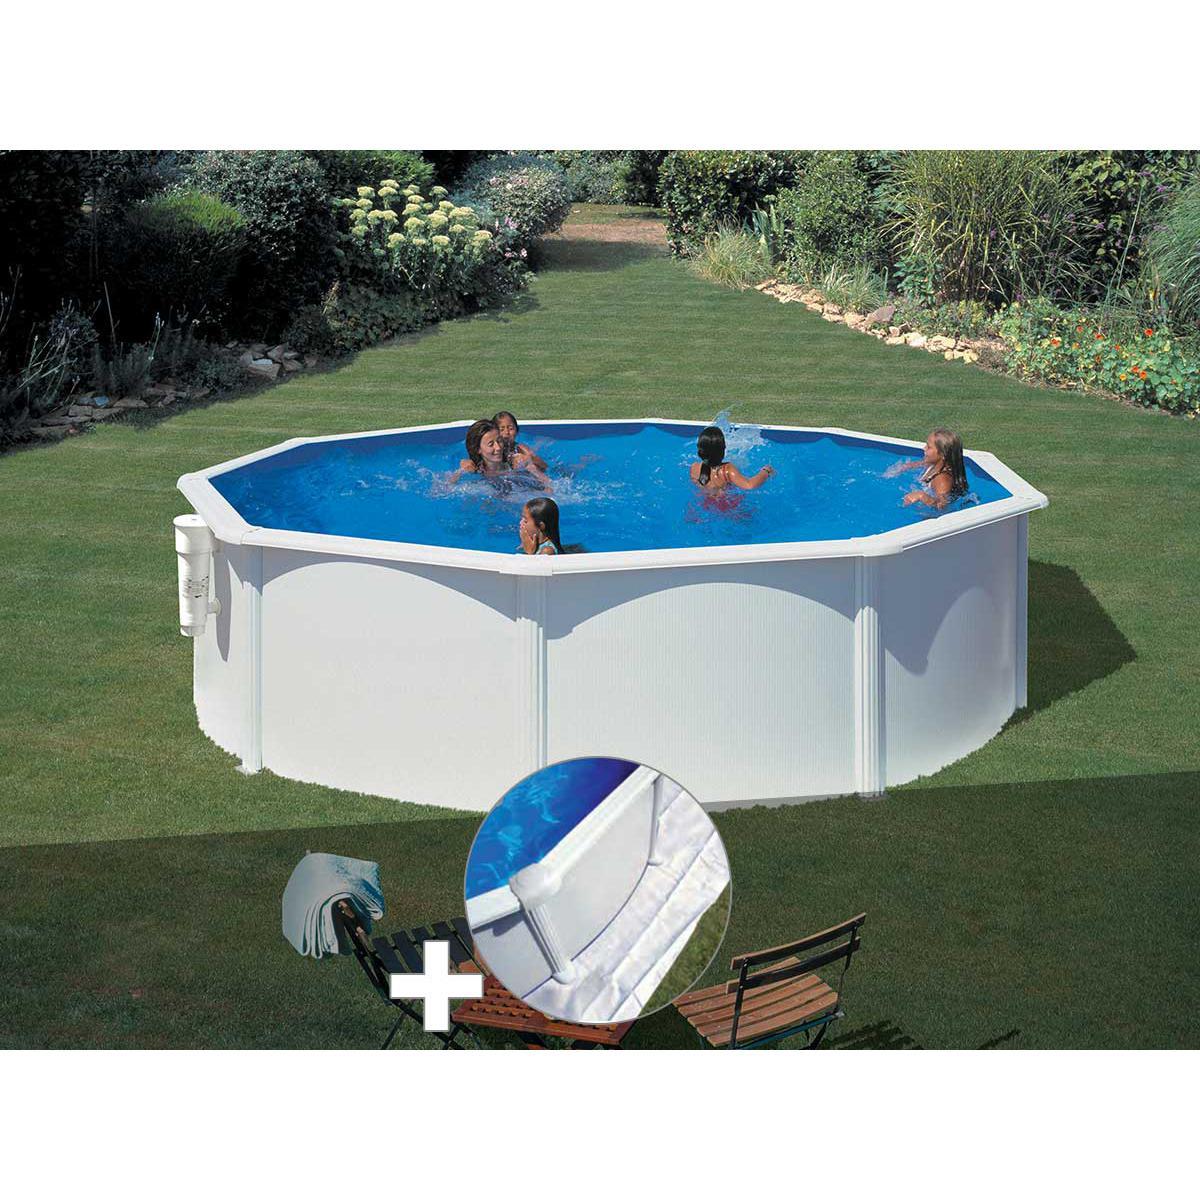 Gre Kit piscine acier blanc Gré Bora Bora ronde 3,70 x 1,22 m + Tapis de sol